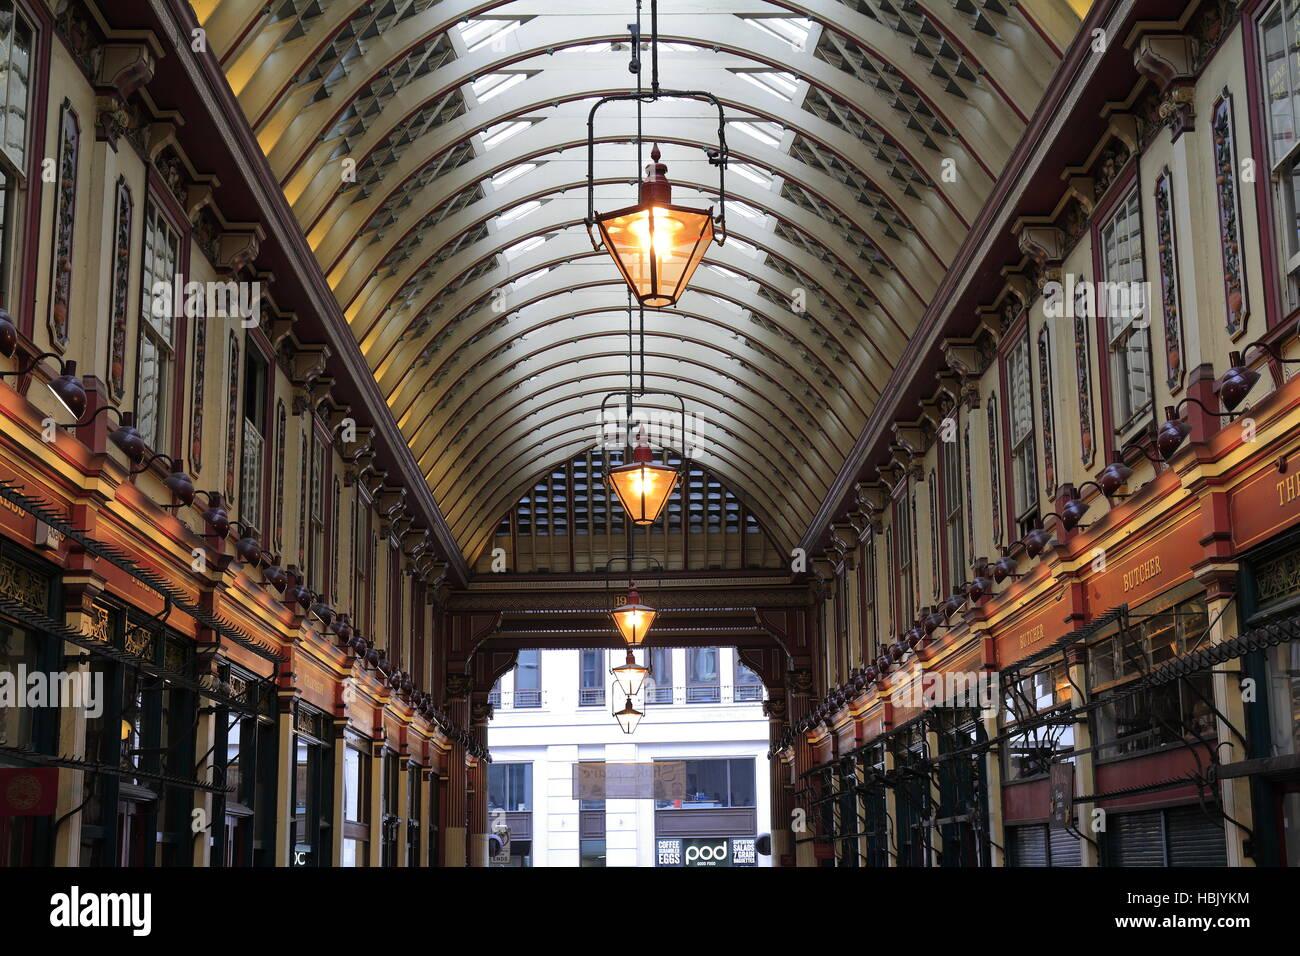 Leadenhall market covered shopping arcade - Stock Image